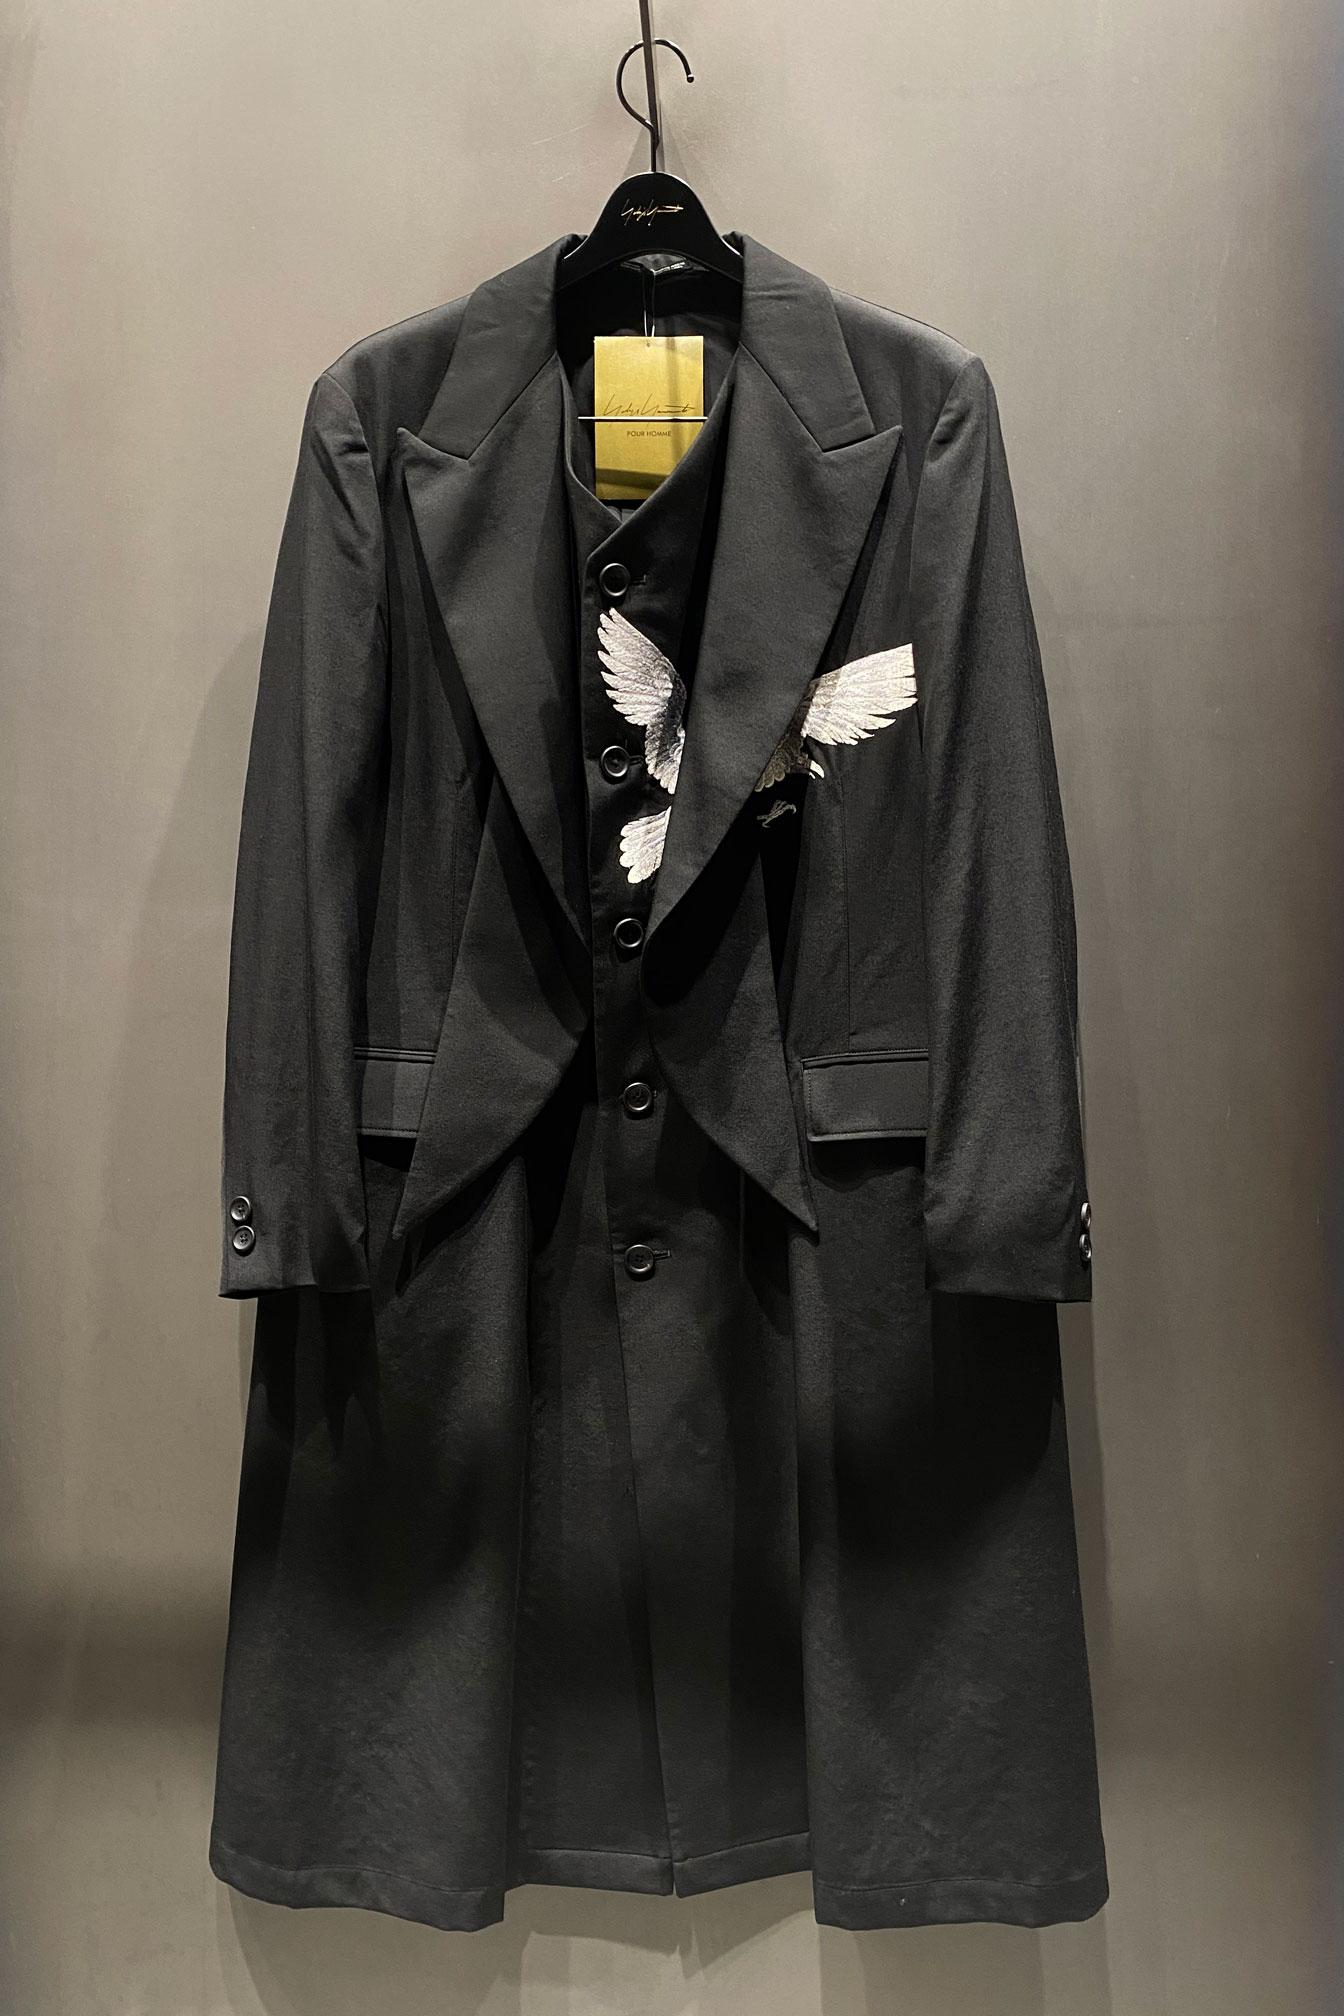 YOHJI YAMAMOTO 经典乌鸦大衣于中国地区复刻发售